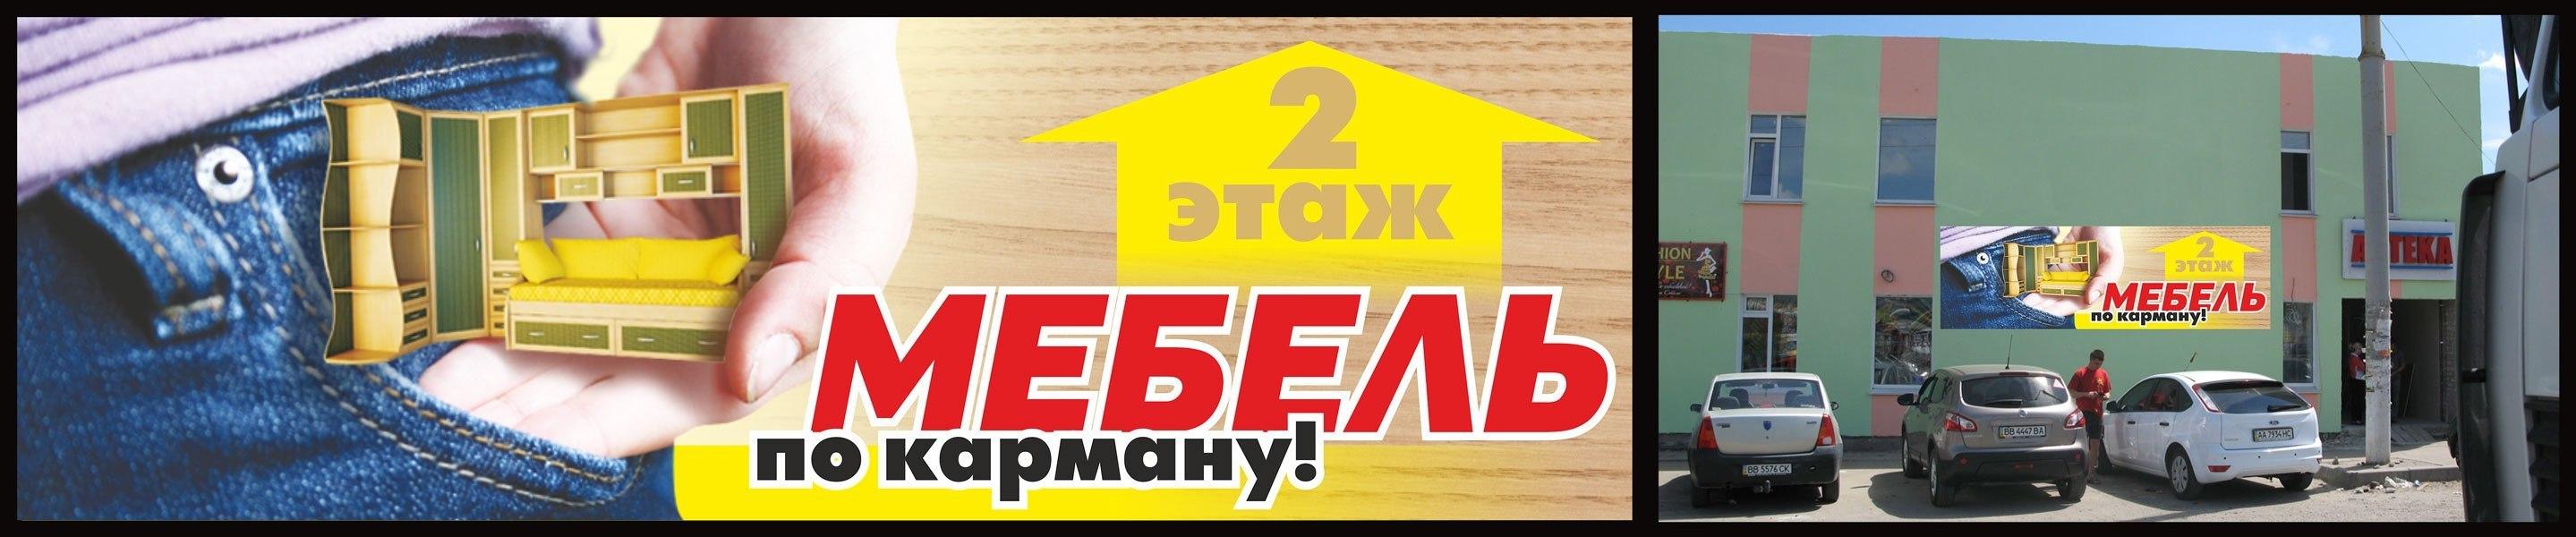 http://www.freelancejob.ru/upload/512/56922484515234.jpg